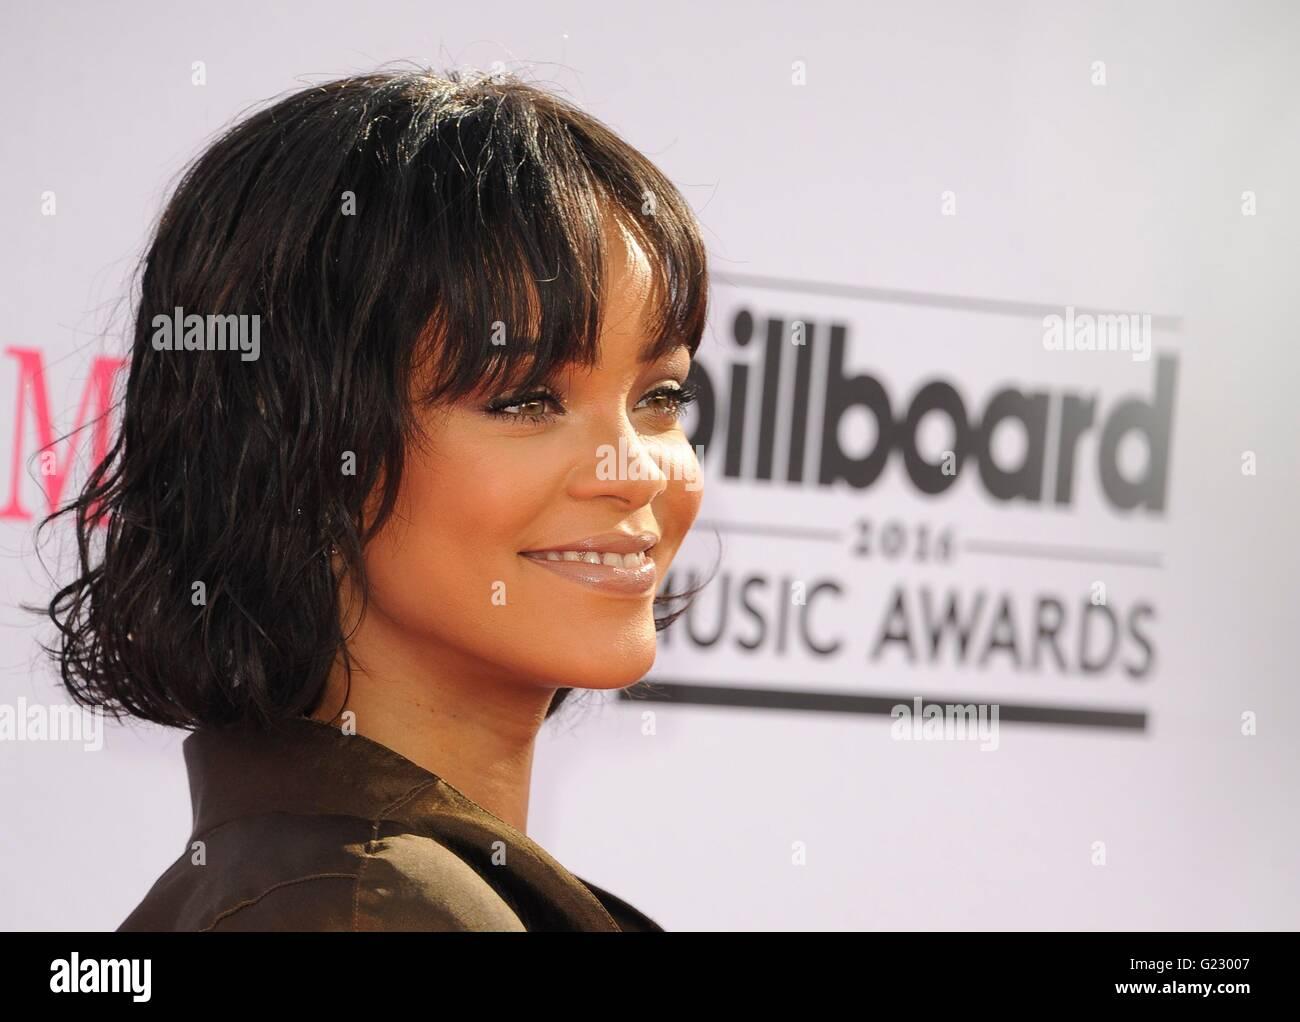 Las Vegas, NV, USA. 22. Mai 2016. Rihanna im Ankunftsbereich für 2016 Billboard Music Awards - Ankünfte Stockbild